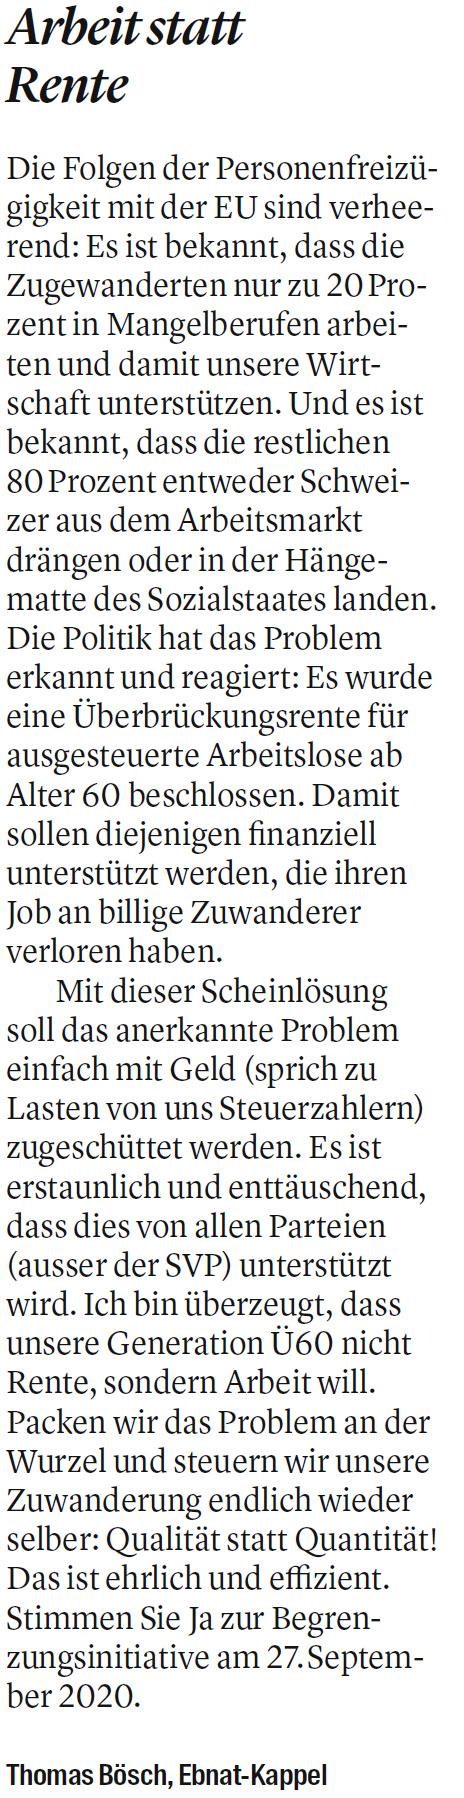 Arbeit statt Rente (Samstag, 18.07.2020)